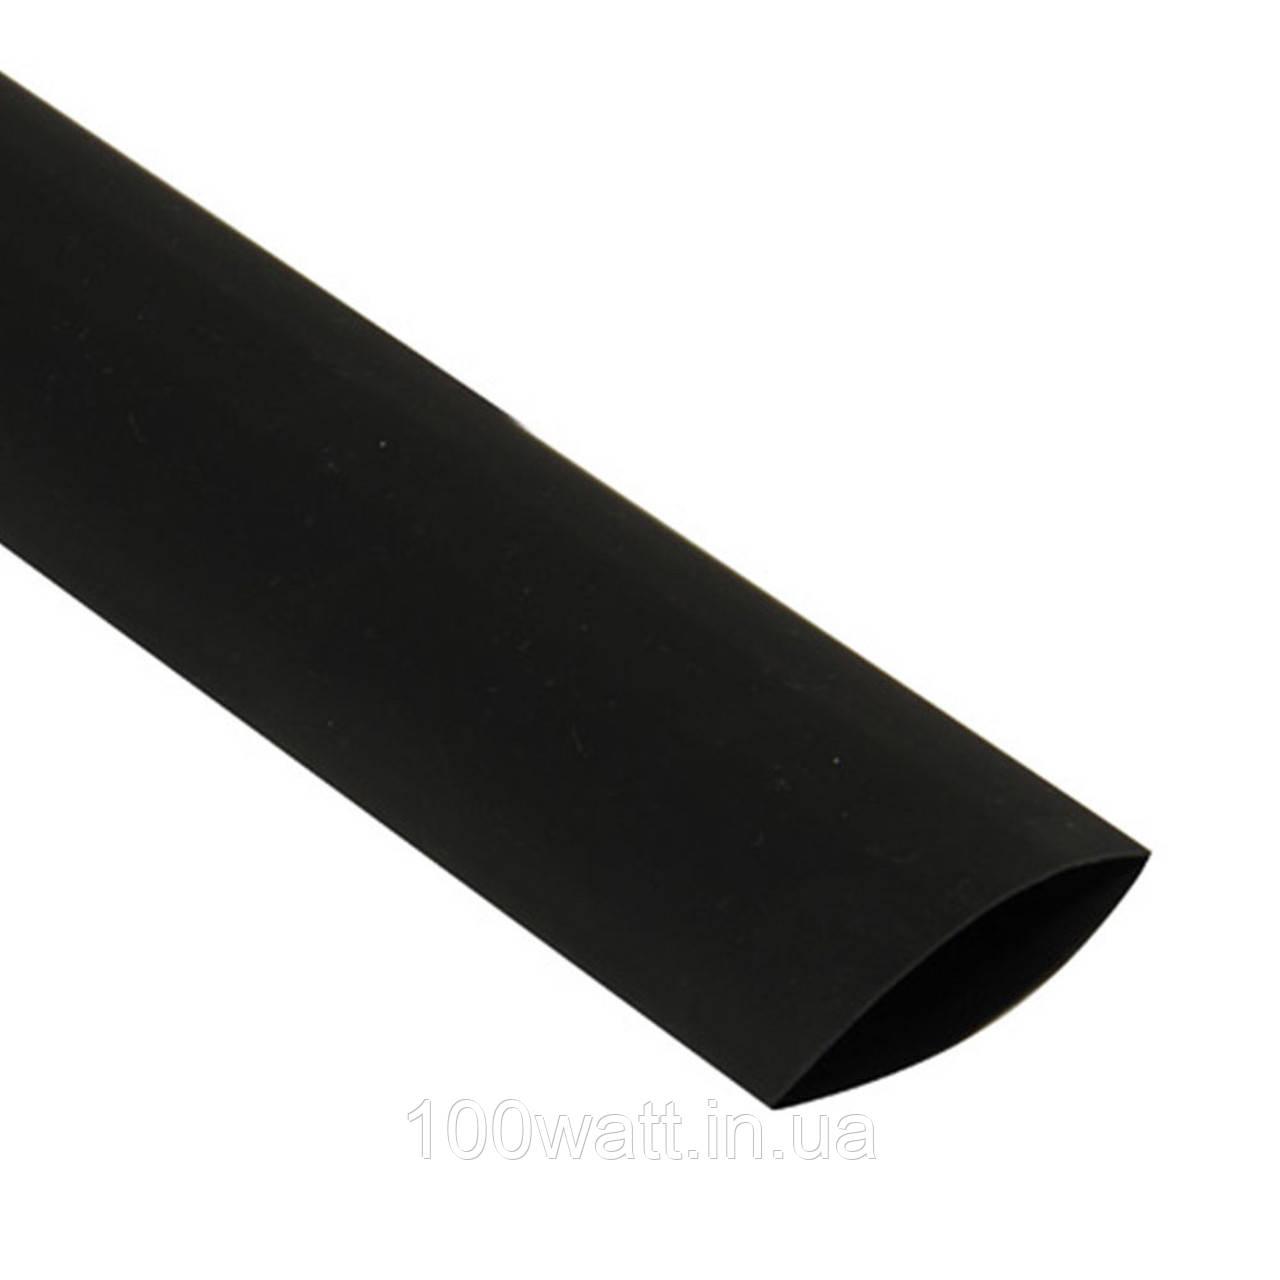 Трубка термоусадочна c клеєм 25.4/8.47 мм, чорна (1м) GAV 365-25.4